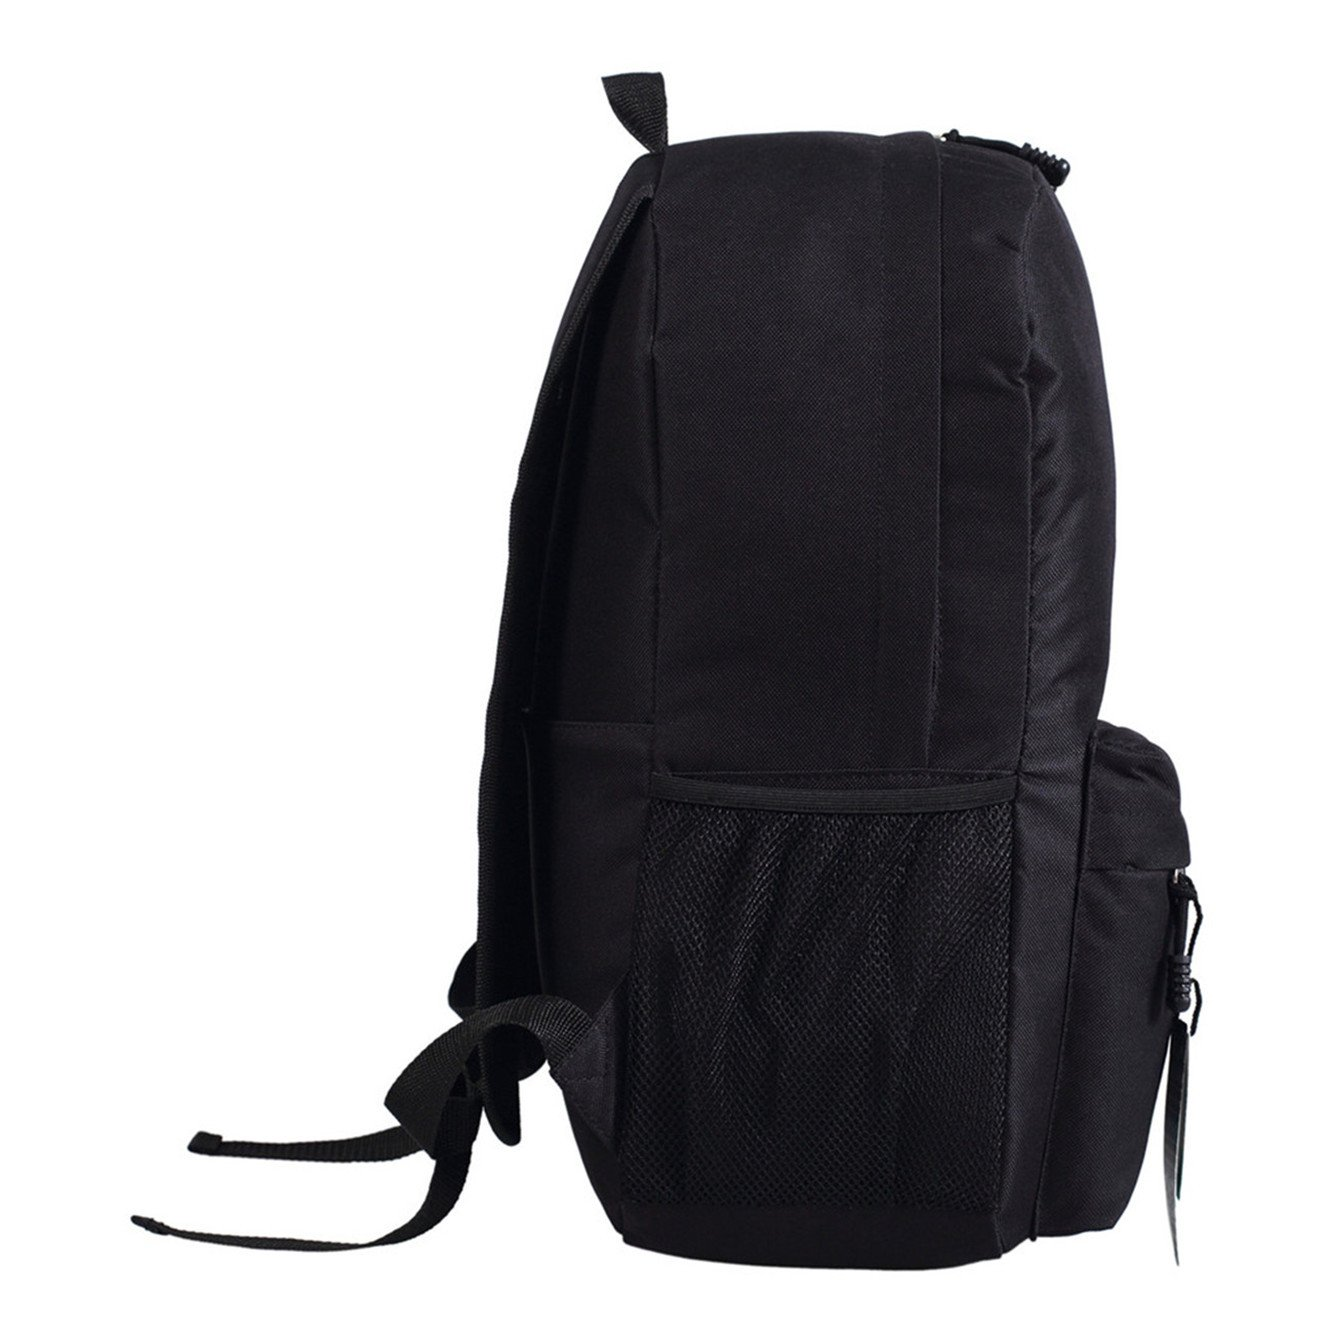 JUSTGOGO Luminous Korean Casual Backpack Daypack Laptop Bag College Bag School Bag (Black) by JUSTGOGO (Image #2)